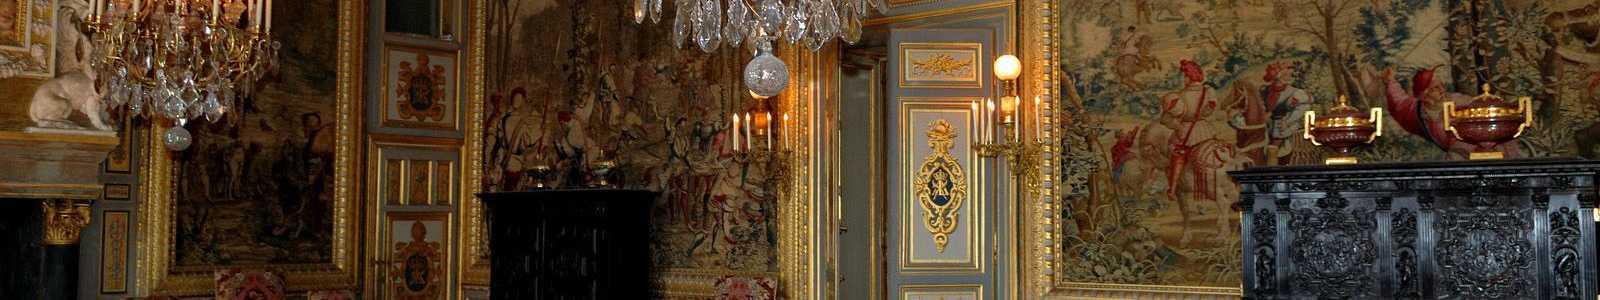 Gallery Antique salon AMPIR